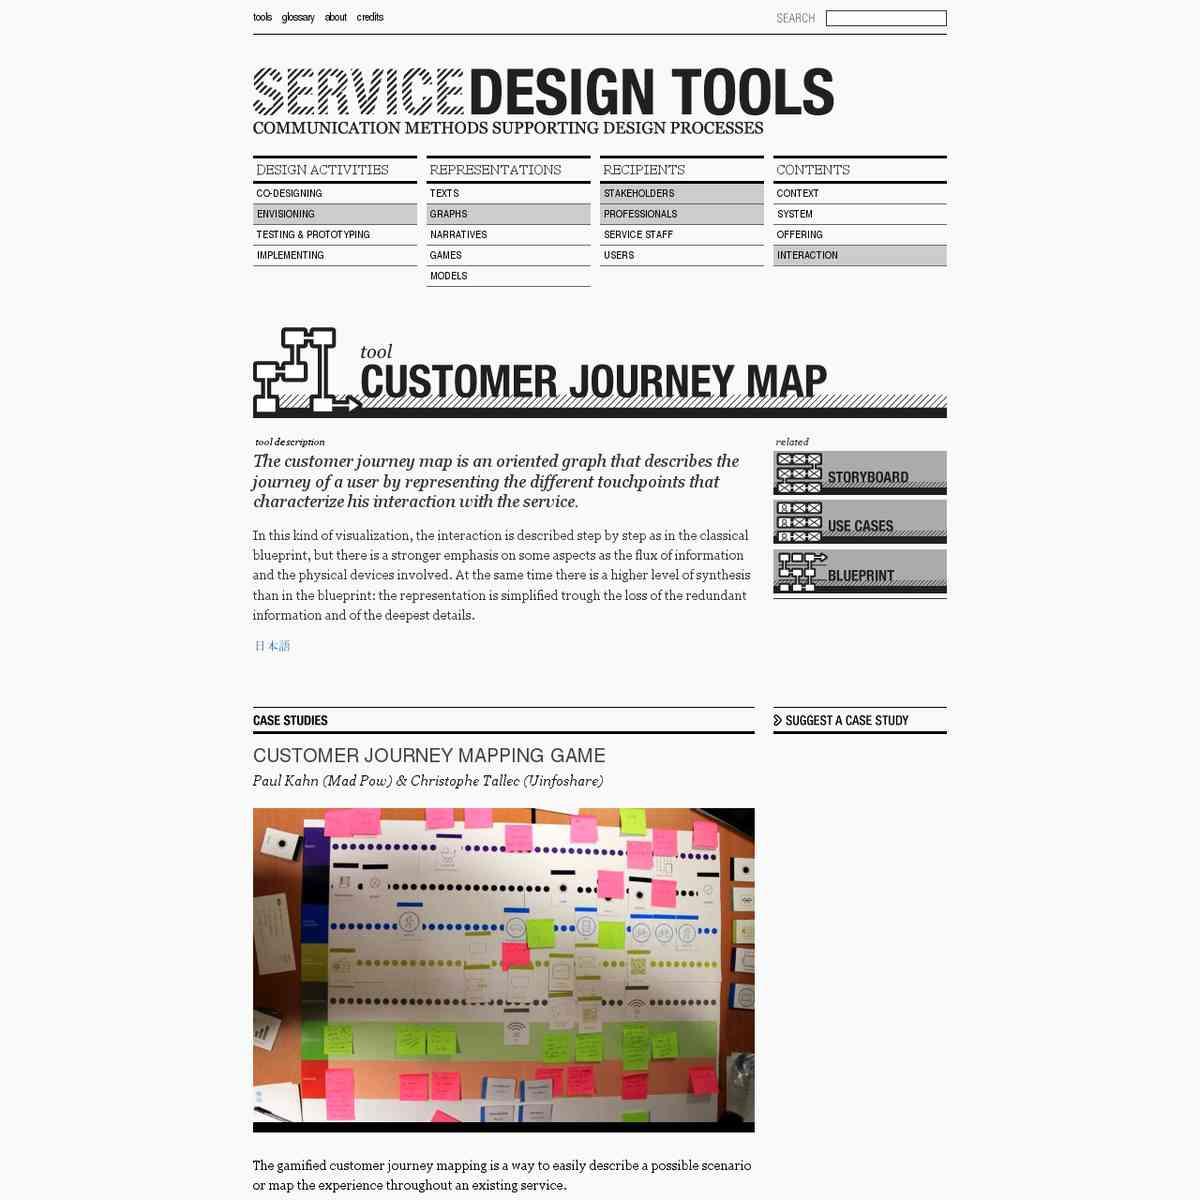 The customer journey map